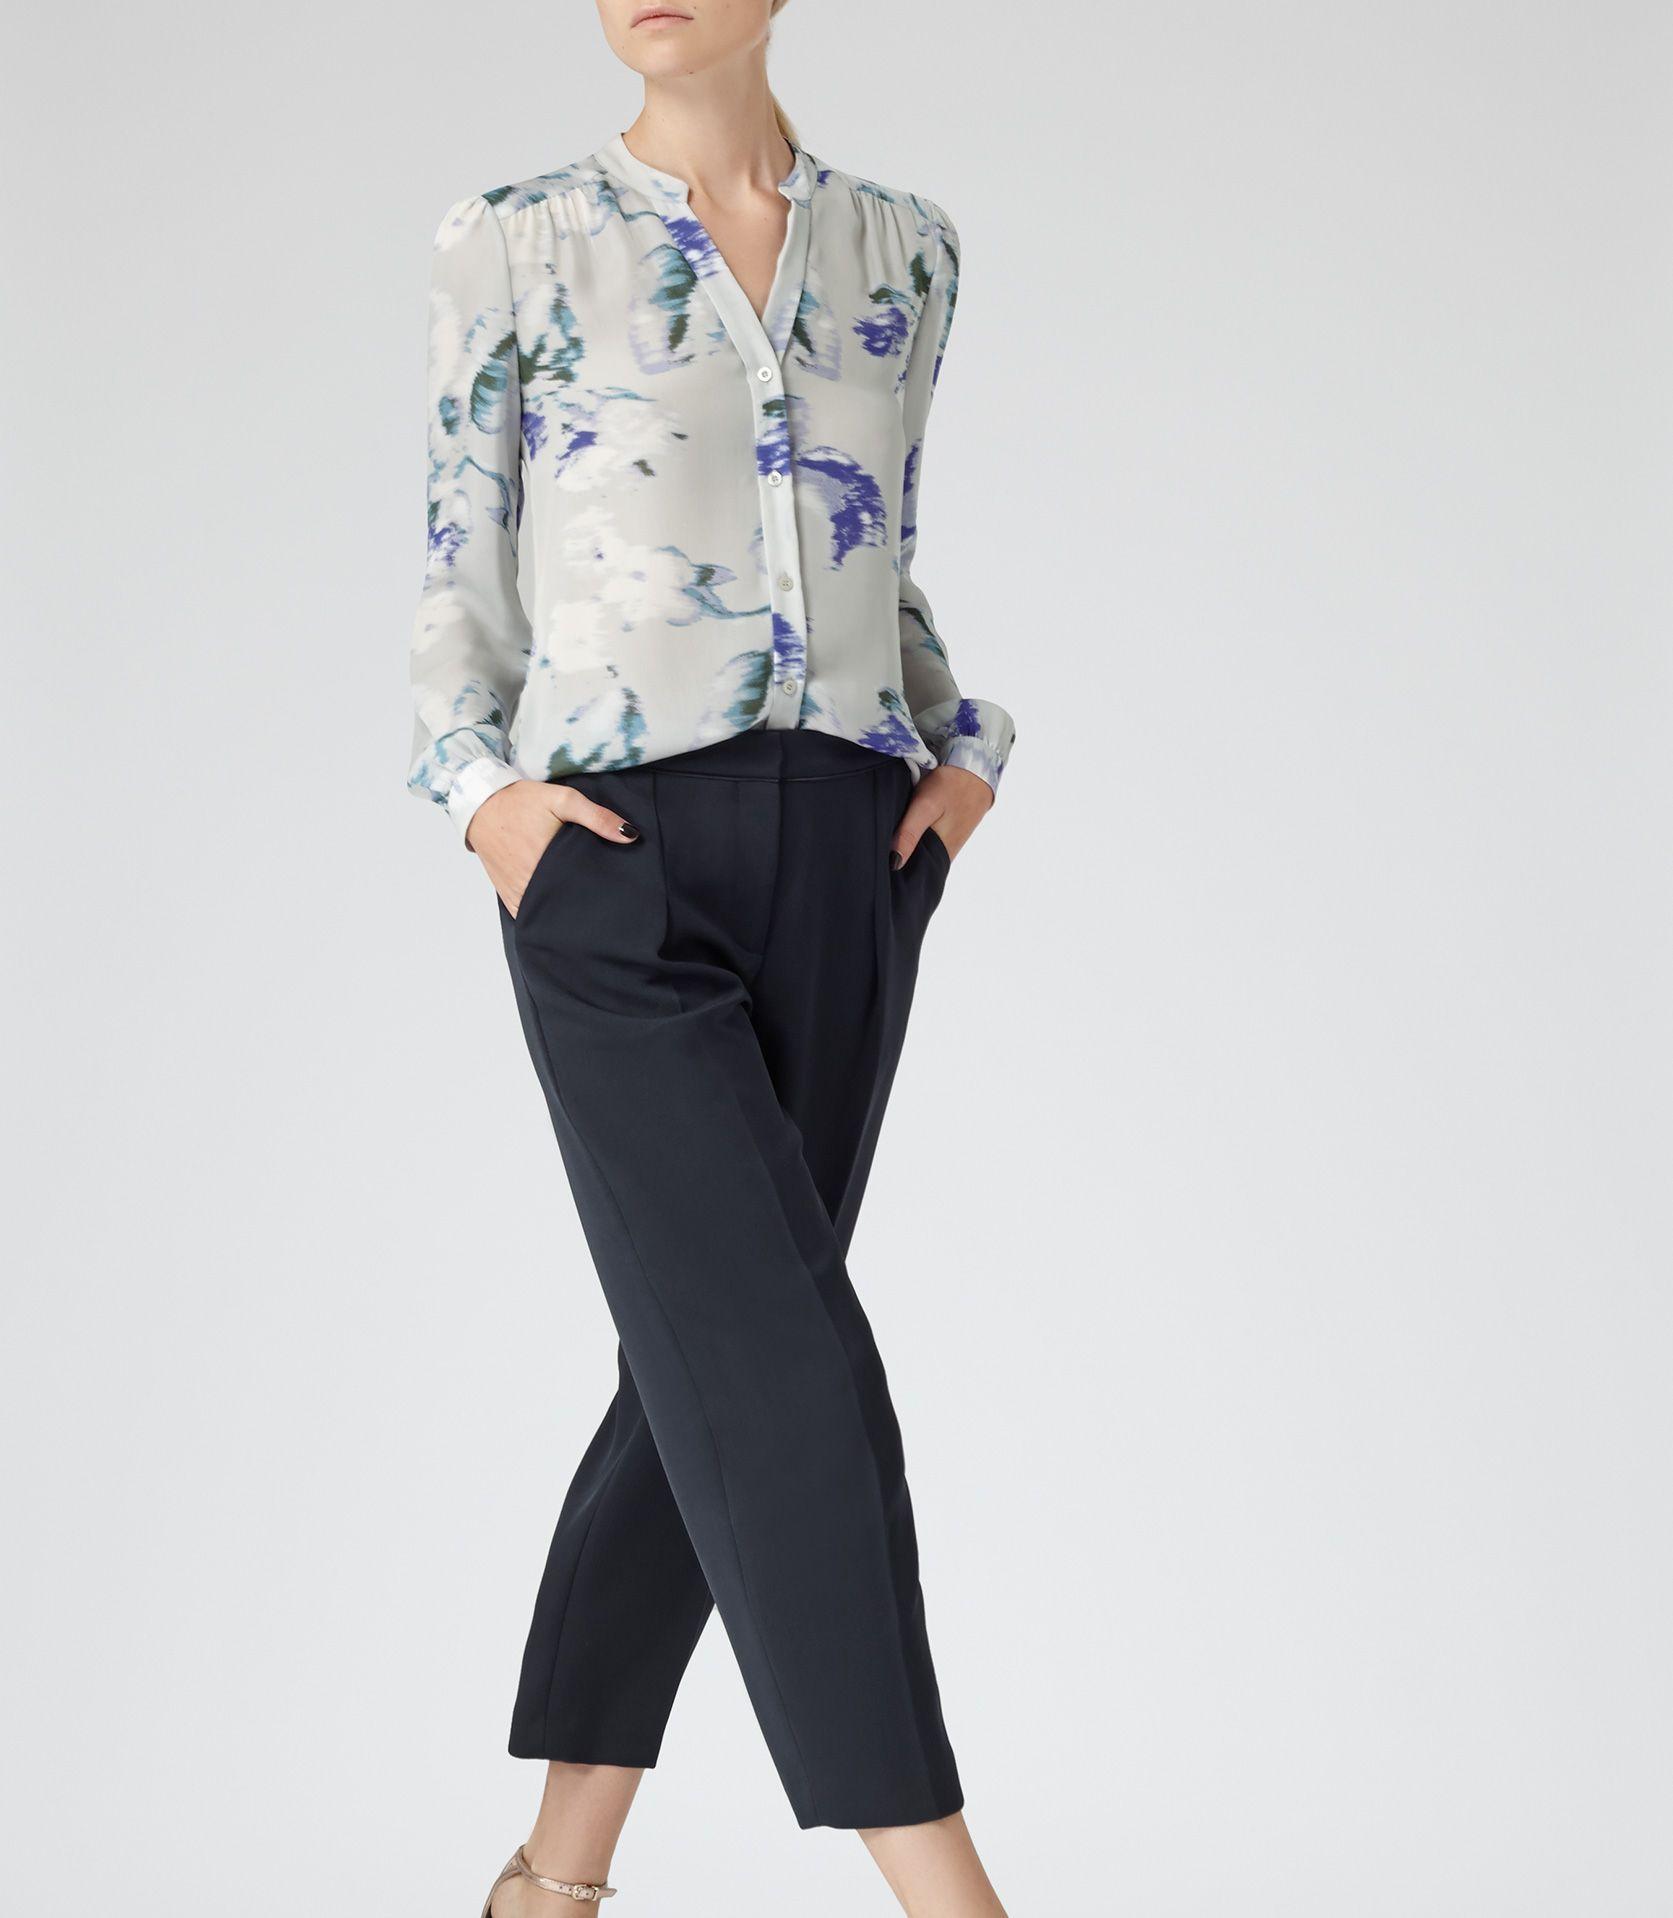 3fc61b567e795 Womens Pansey Print Silk Blurred Bloom Blouse - Reiss Delores ...